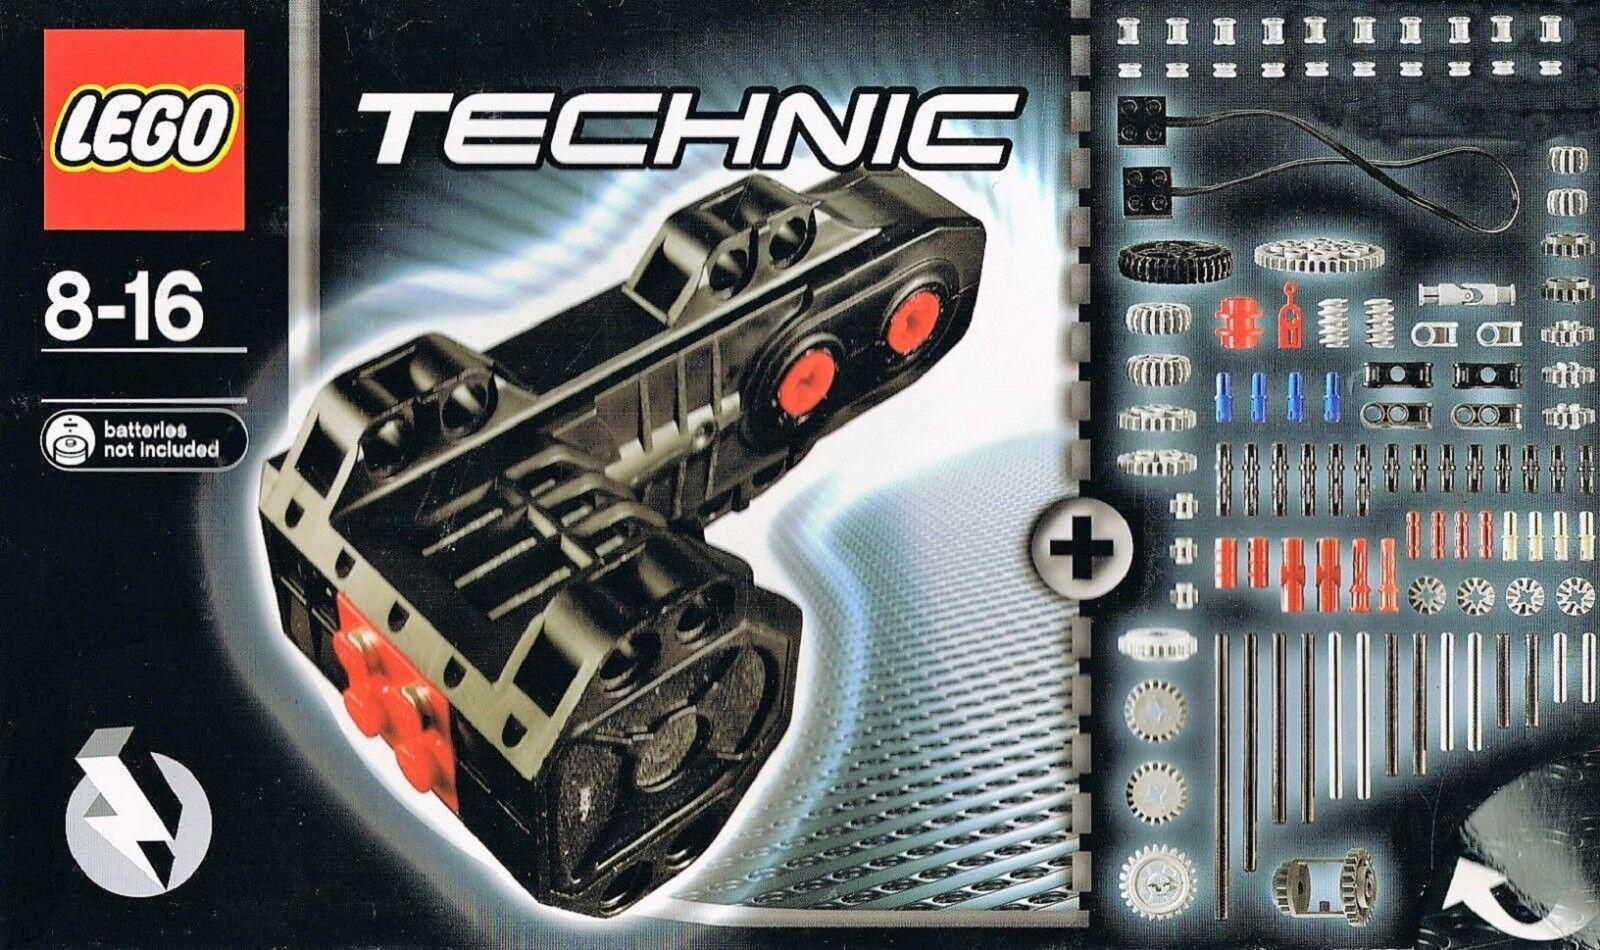 LEGO Power moteur 9 v 5292 8285 8285 8285 8421 8376 8475 8366 8287 f550ca